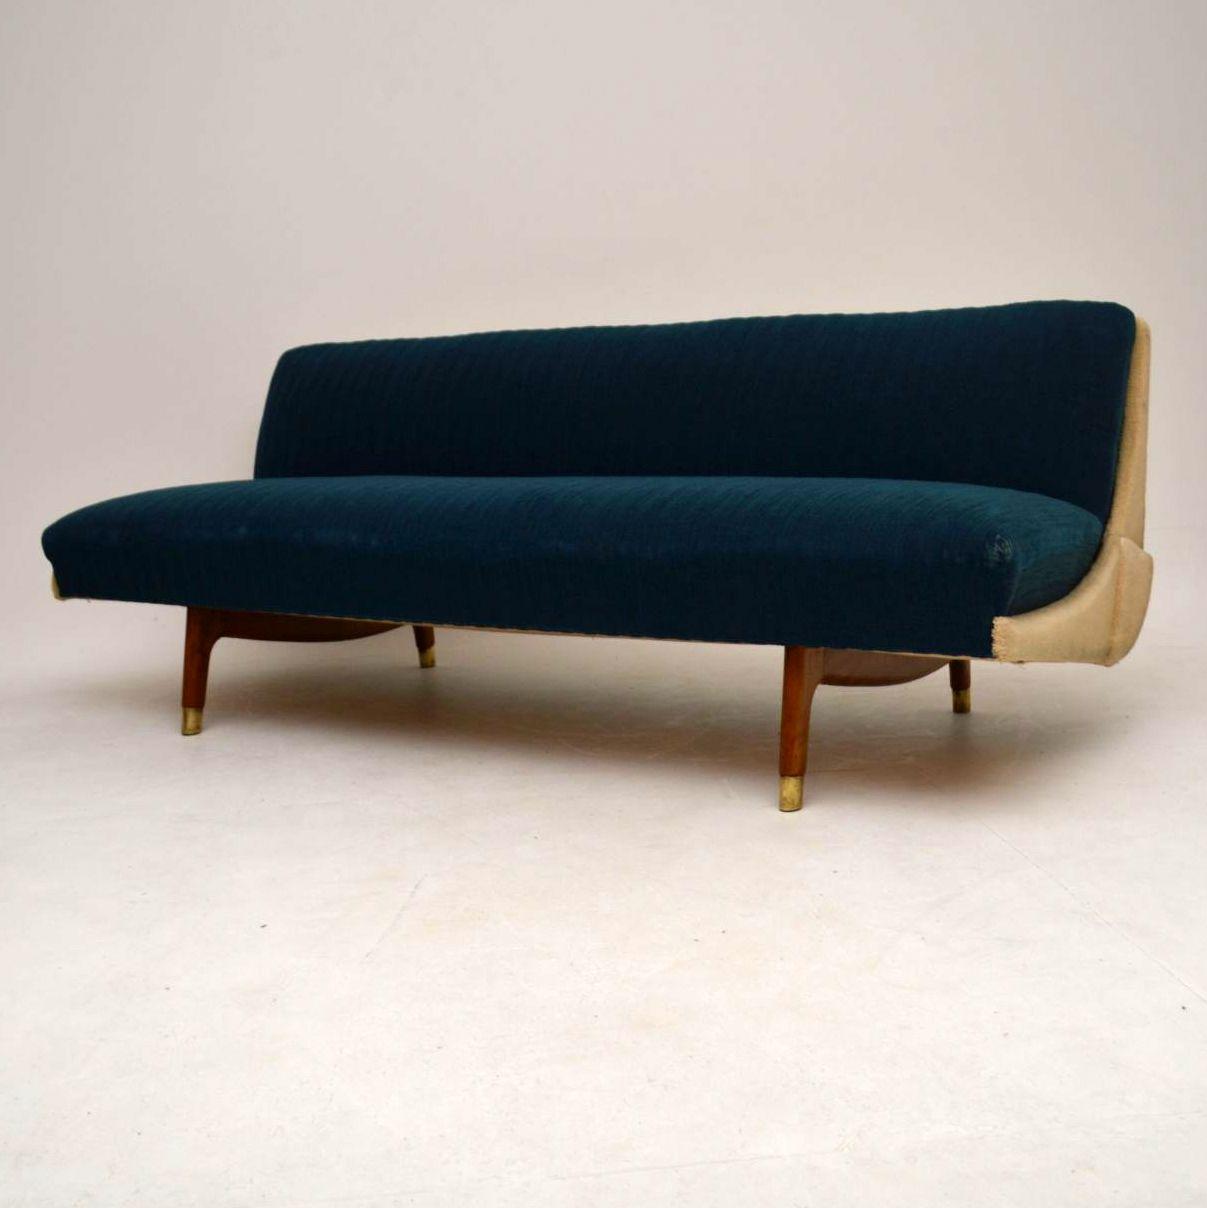 Danish Retro Sofa Bed Vintage 1950 S